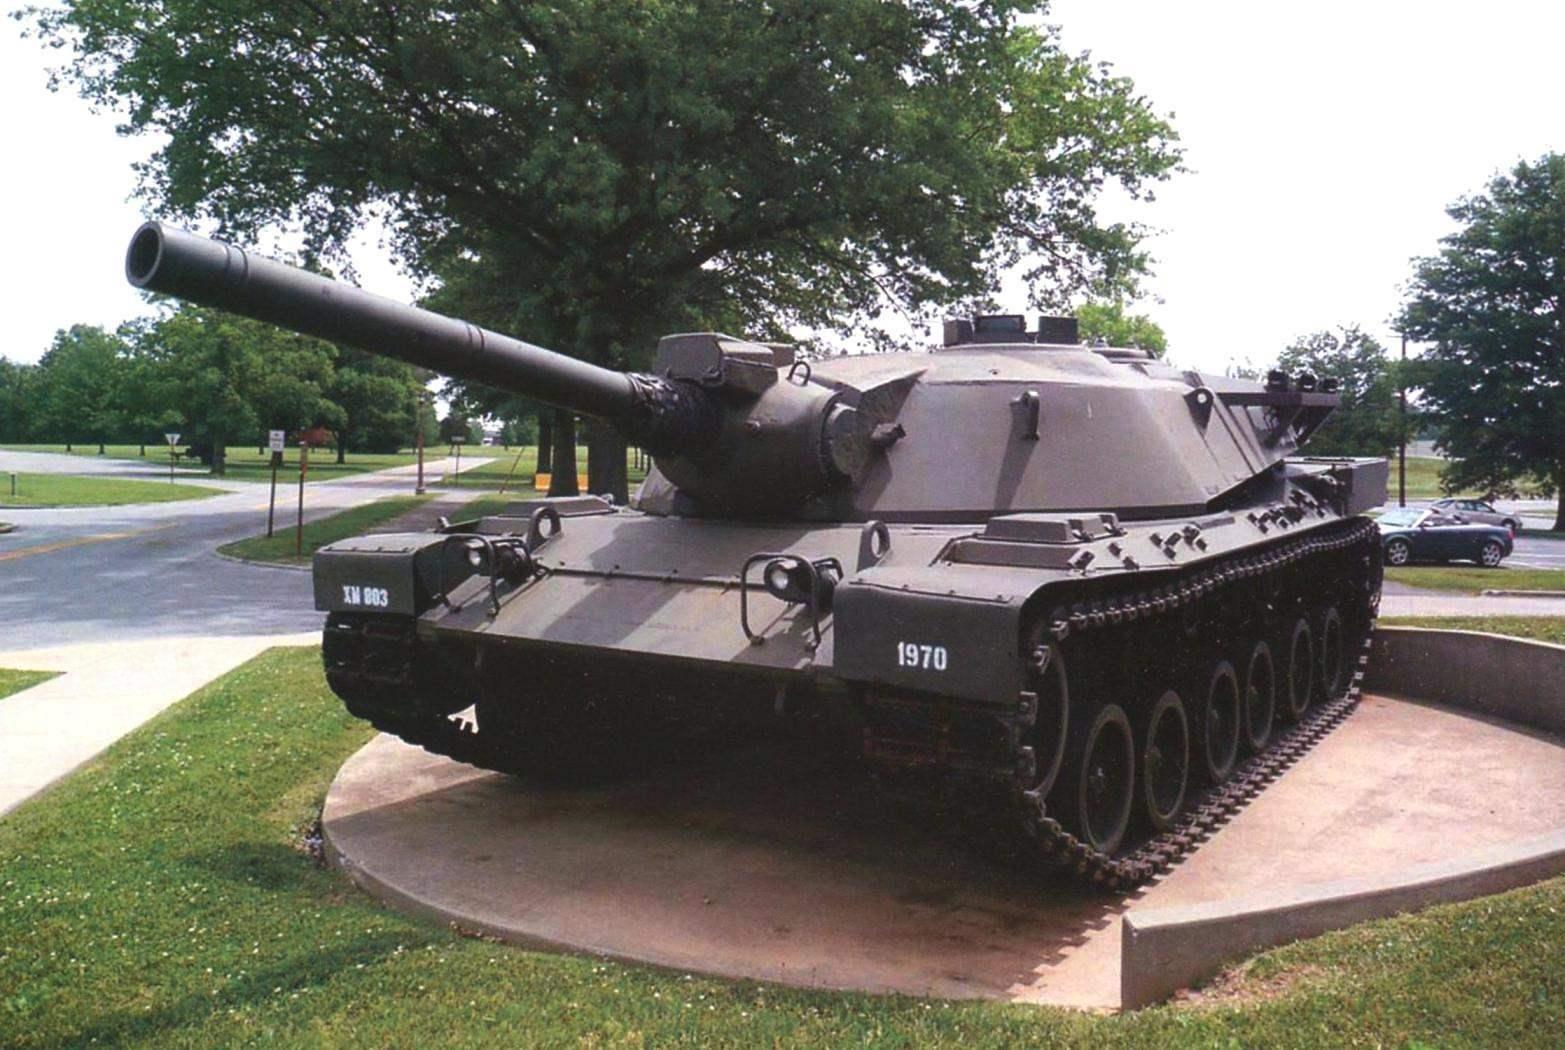 Американский прототип танка под индексом ХМ803 в экспозиции Музея генерала Дж. Паттона в Форт-Ноксе (штата Кентукки, США)